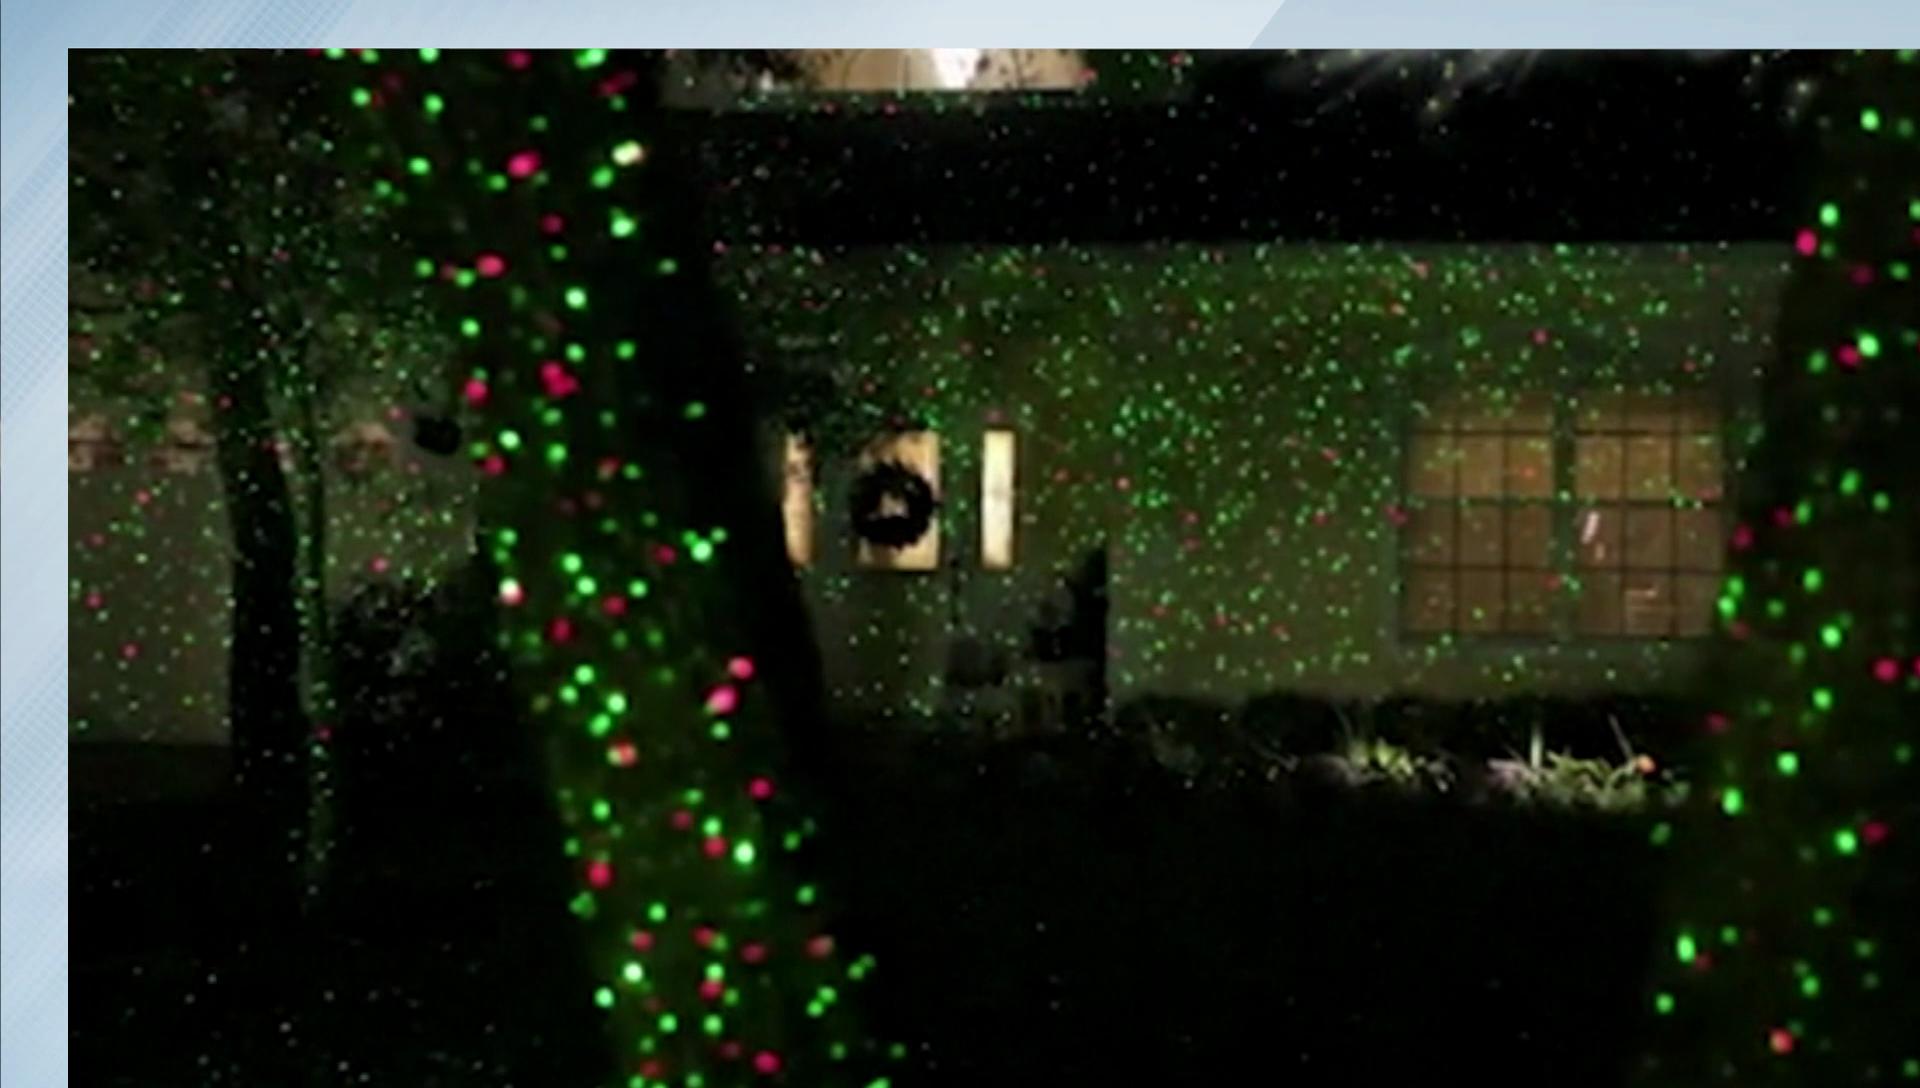 Next Question Are laser Christmas lights dangerous to pilots